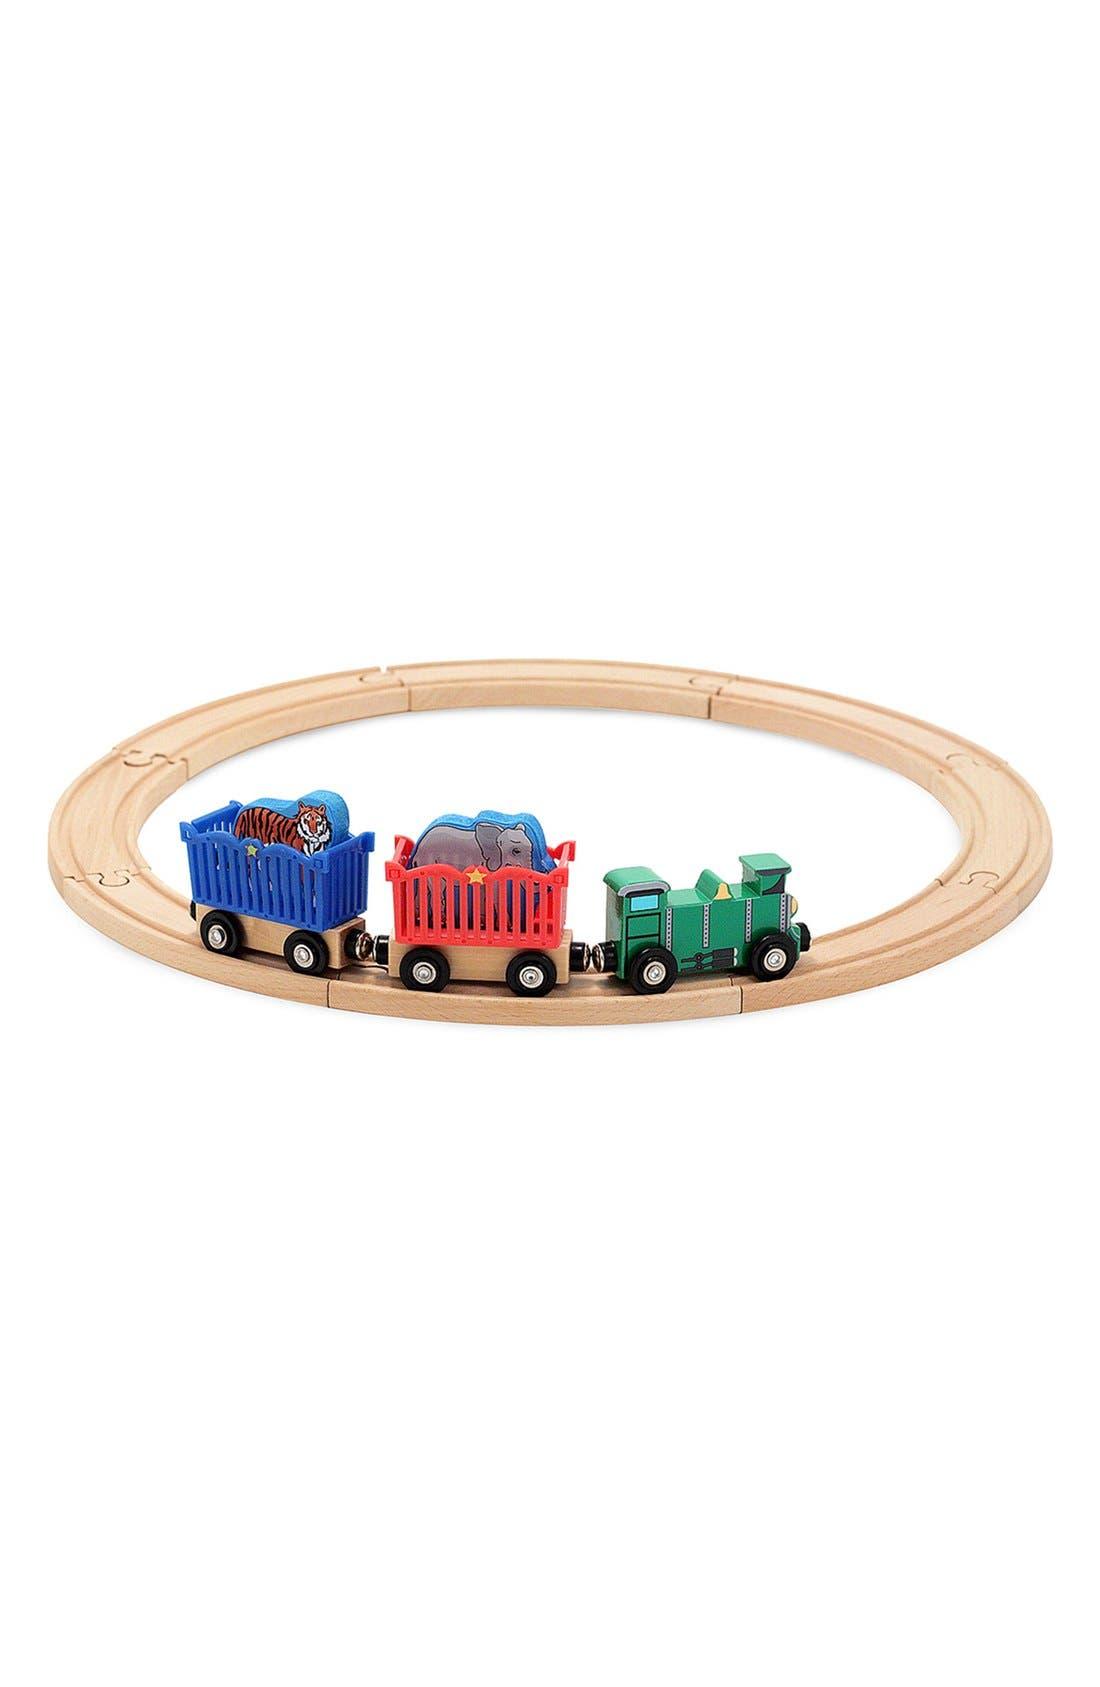 Main Image - Melissa & Doug Zoo Animal Train Set